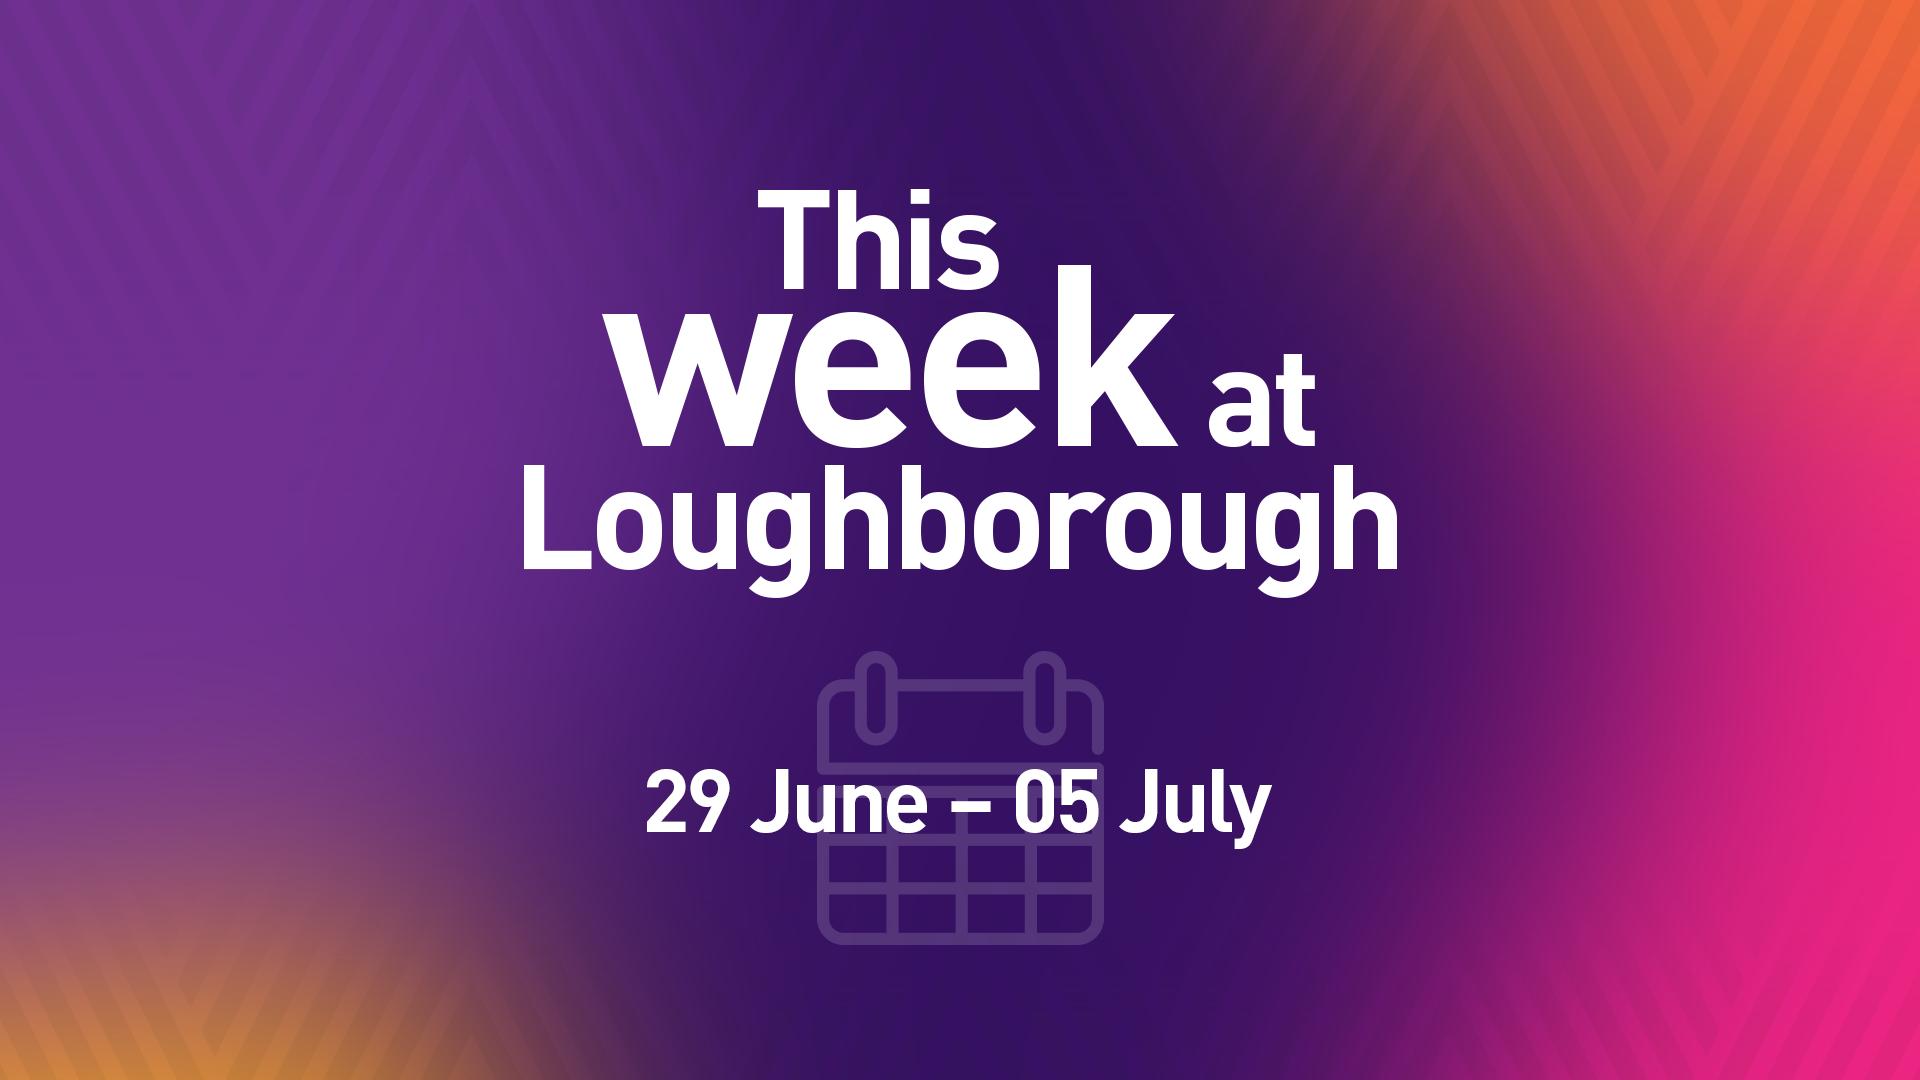 This Virtual Week at Loughborough | 29th June 2020